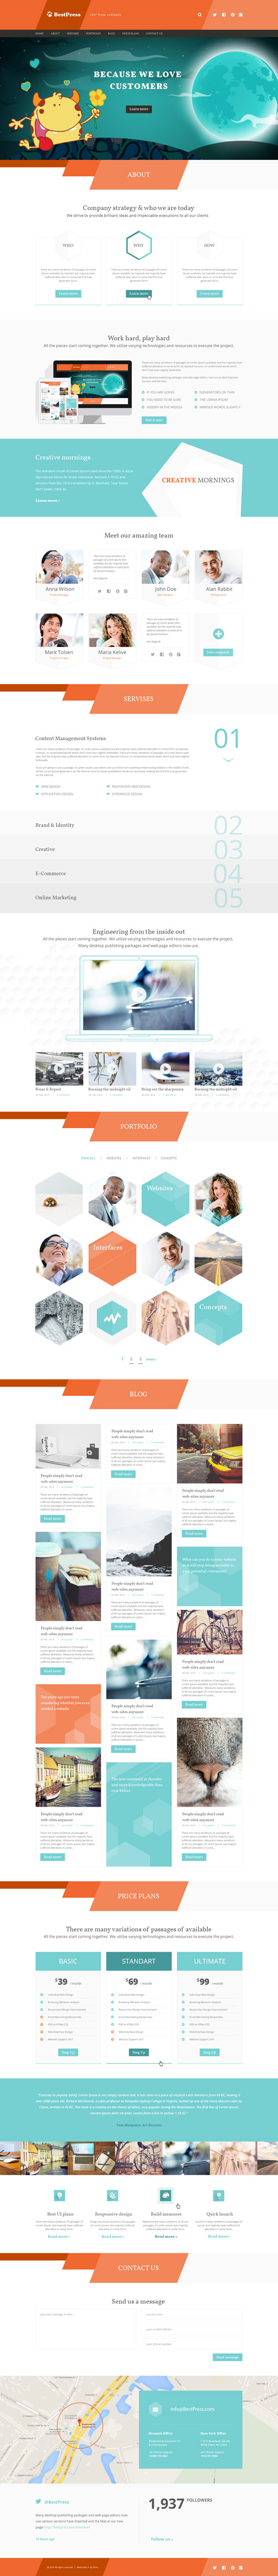 BestPress - Creative Landing Page